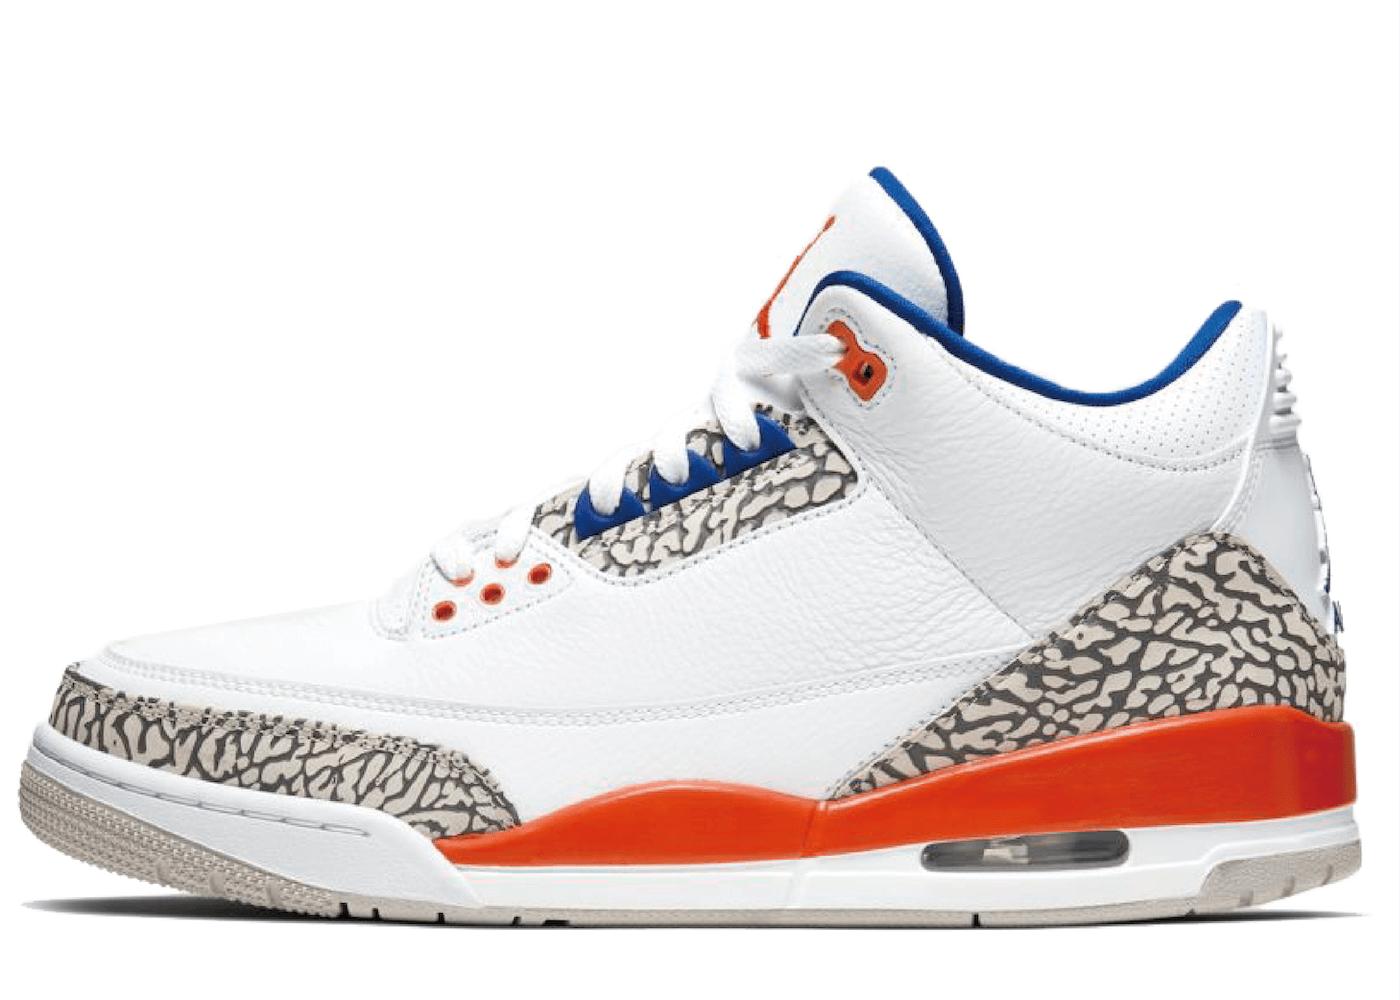 Nike Air Jordan 3 Retro Knicks (White/Orange)の写真